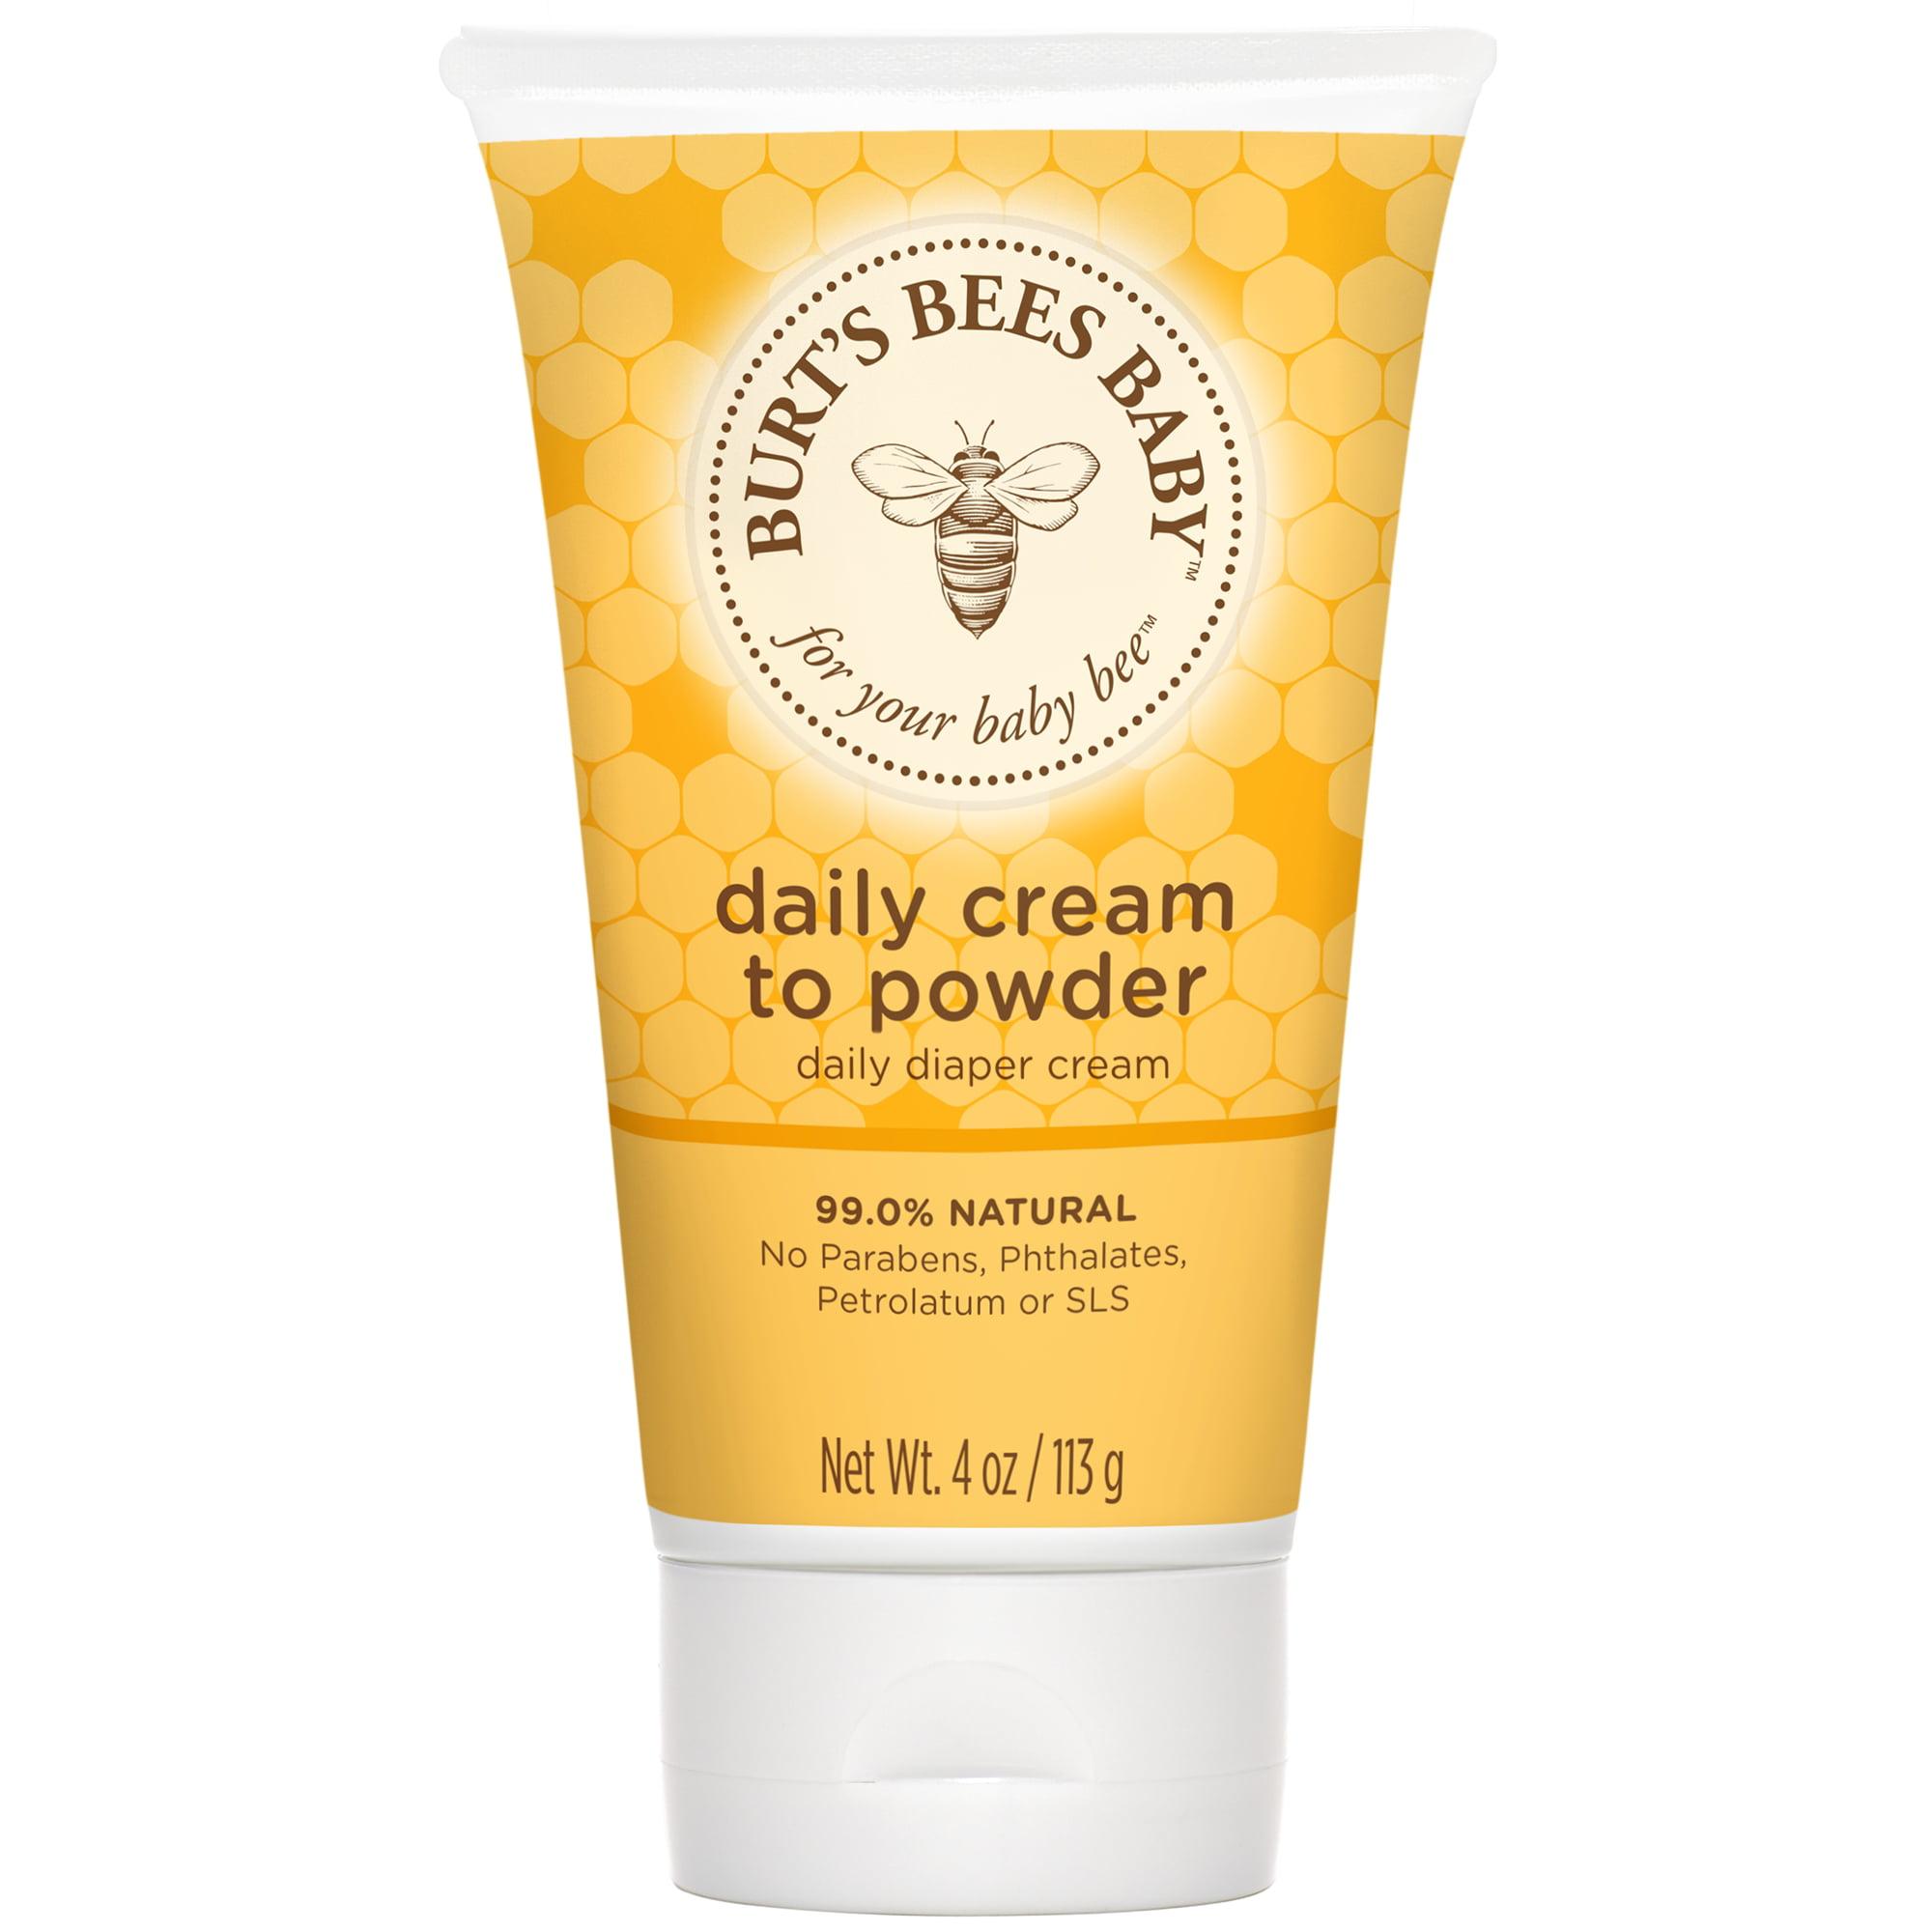 Burt's Bees Baby Daily Cream to Powder, Talc-Free Diaper Rash Cream - 4 oz Tube